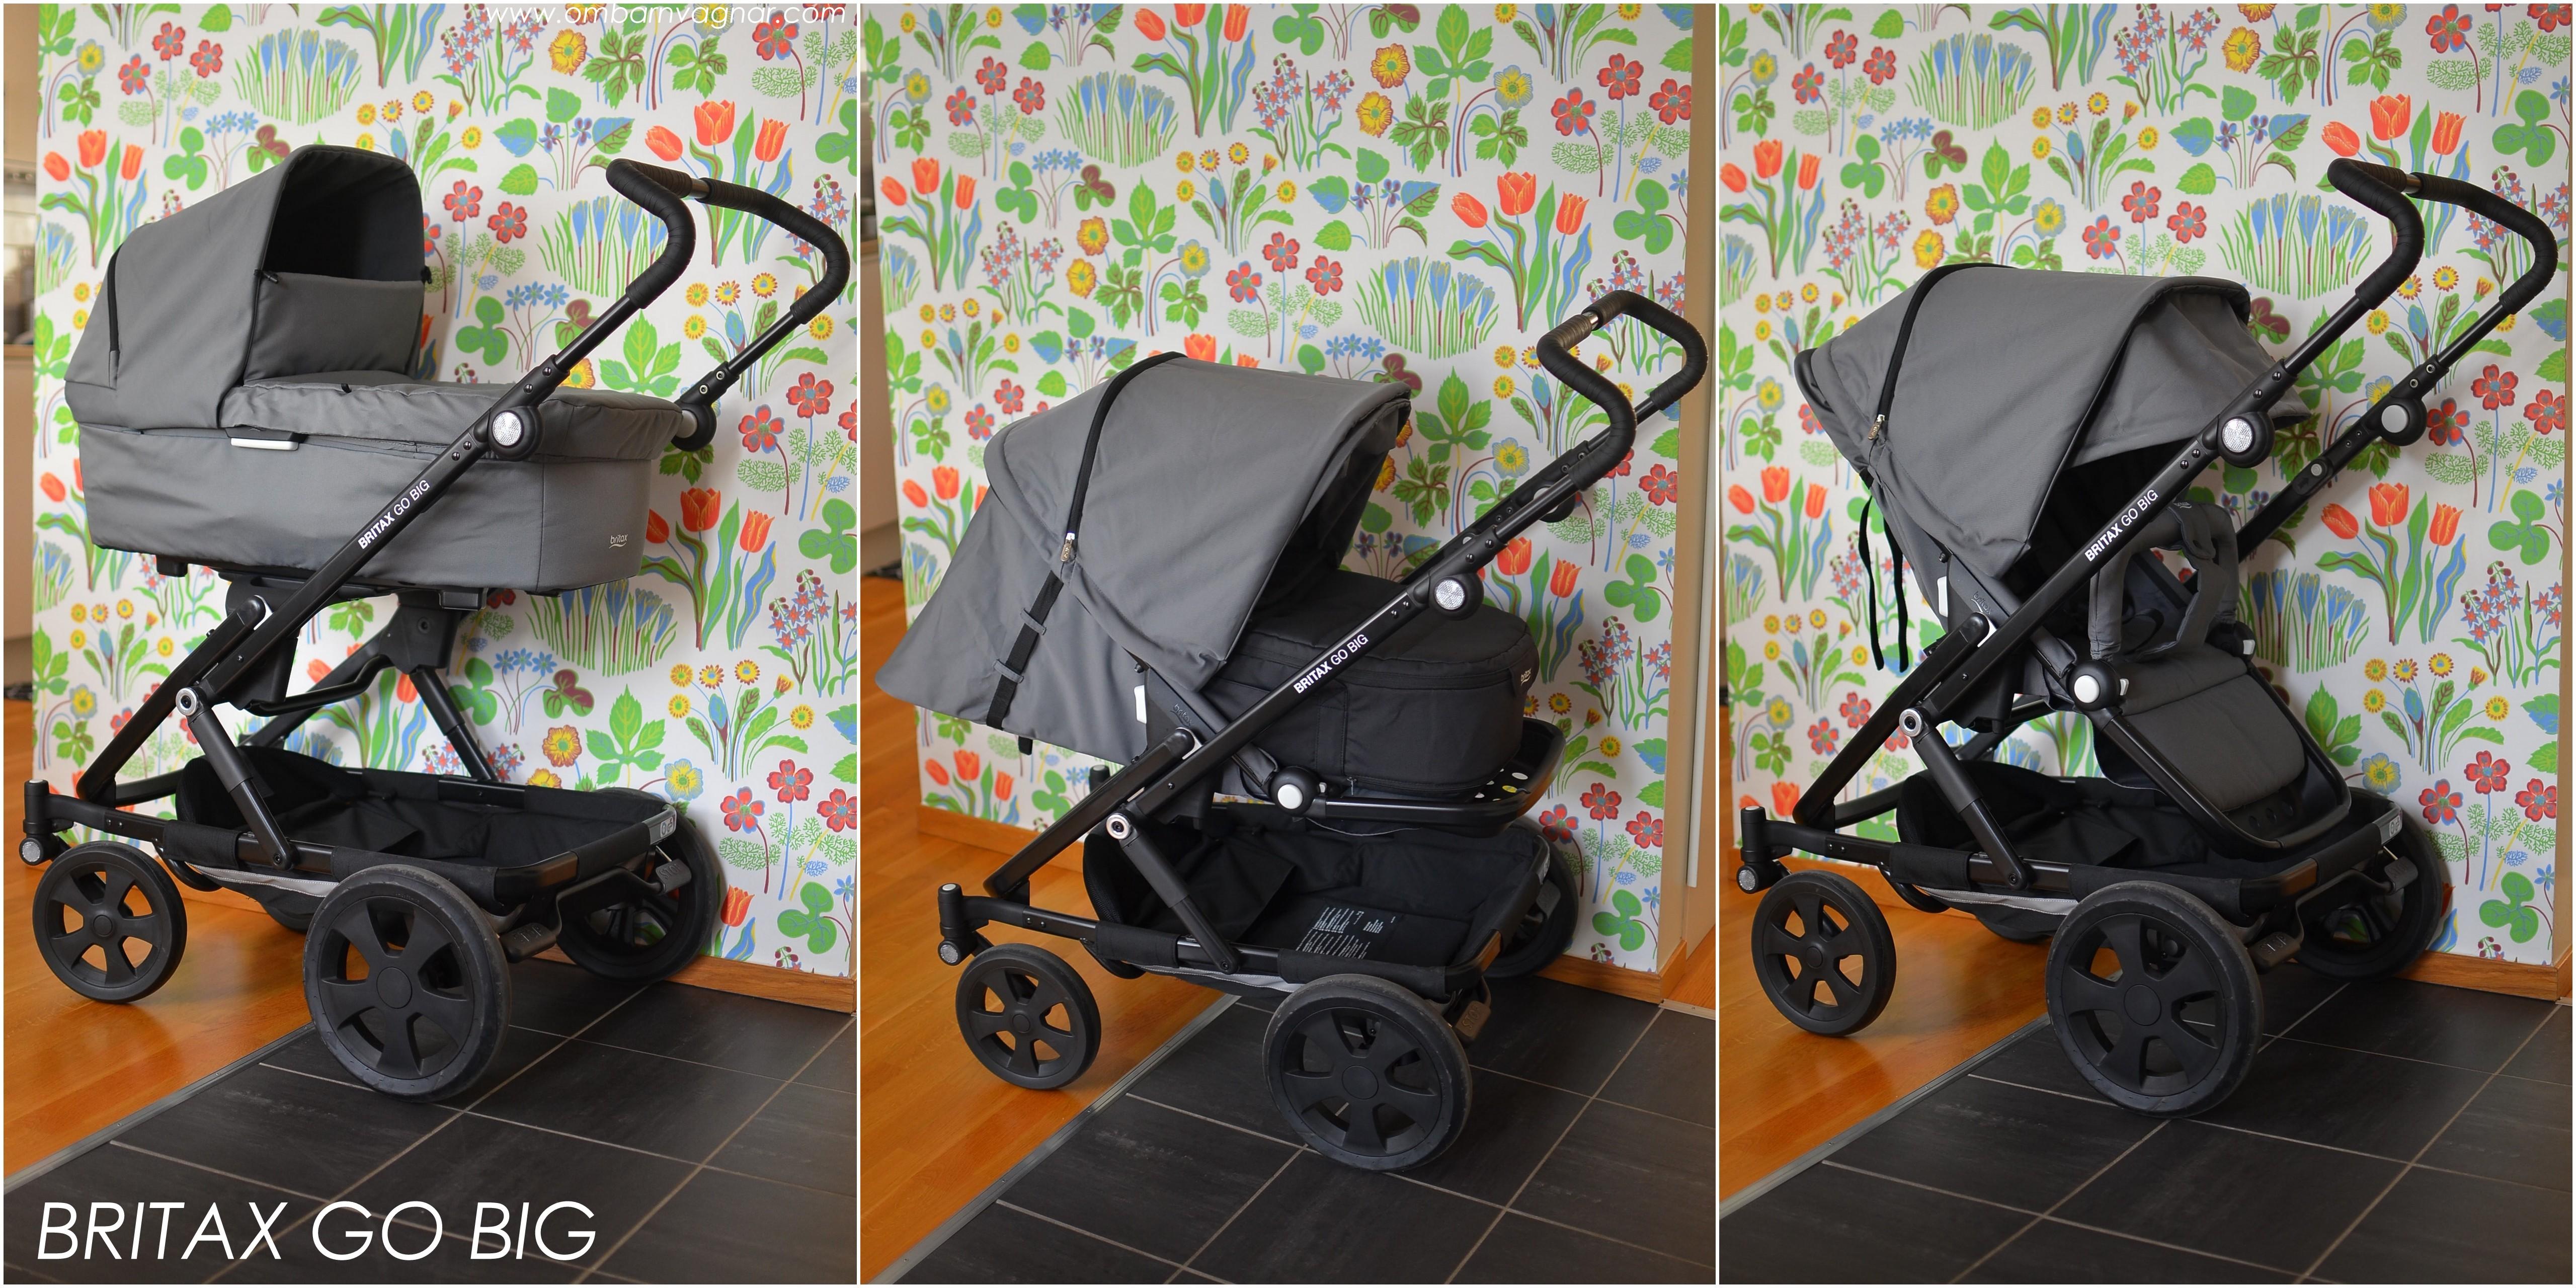 britax go big en f rsta titt allt om barnvagnar. Black Bedroom Furniture Sets. Home Design Ideas